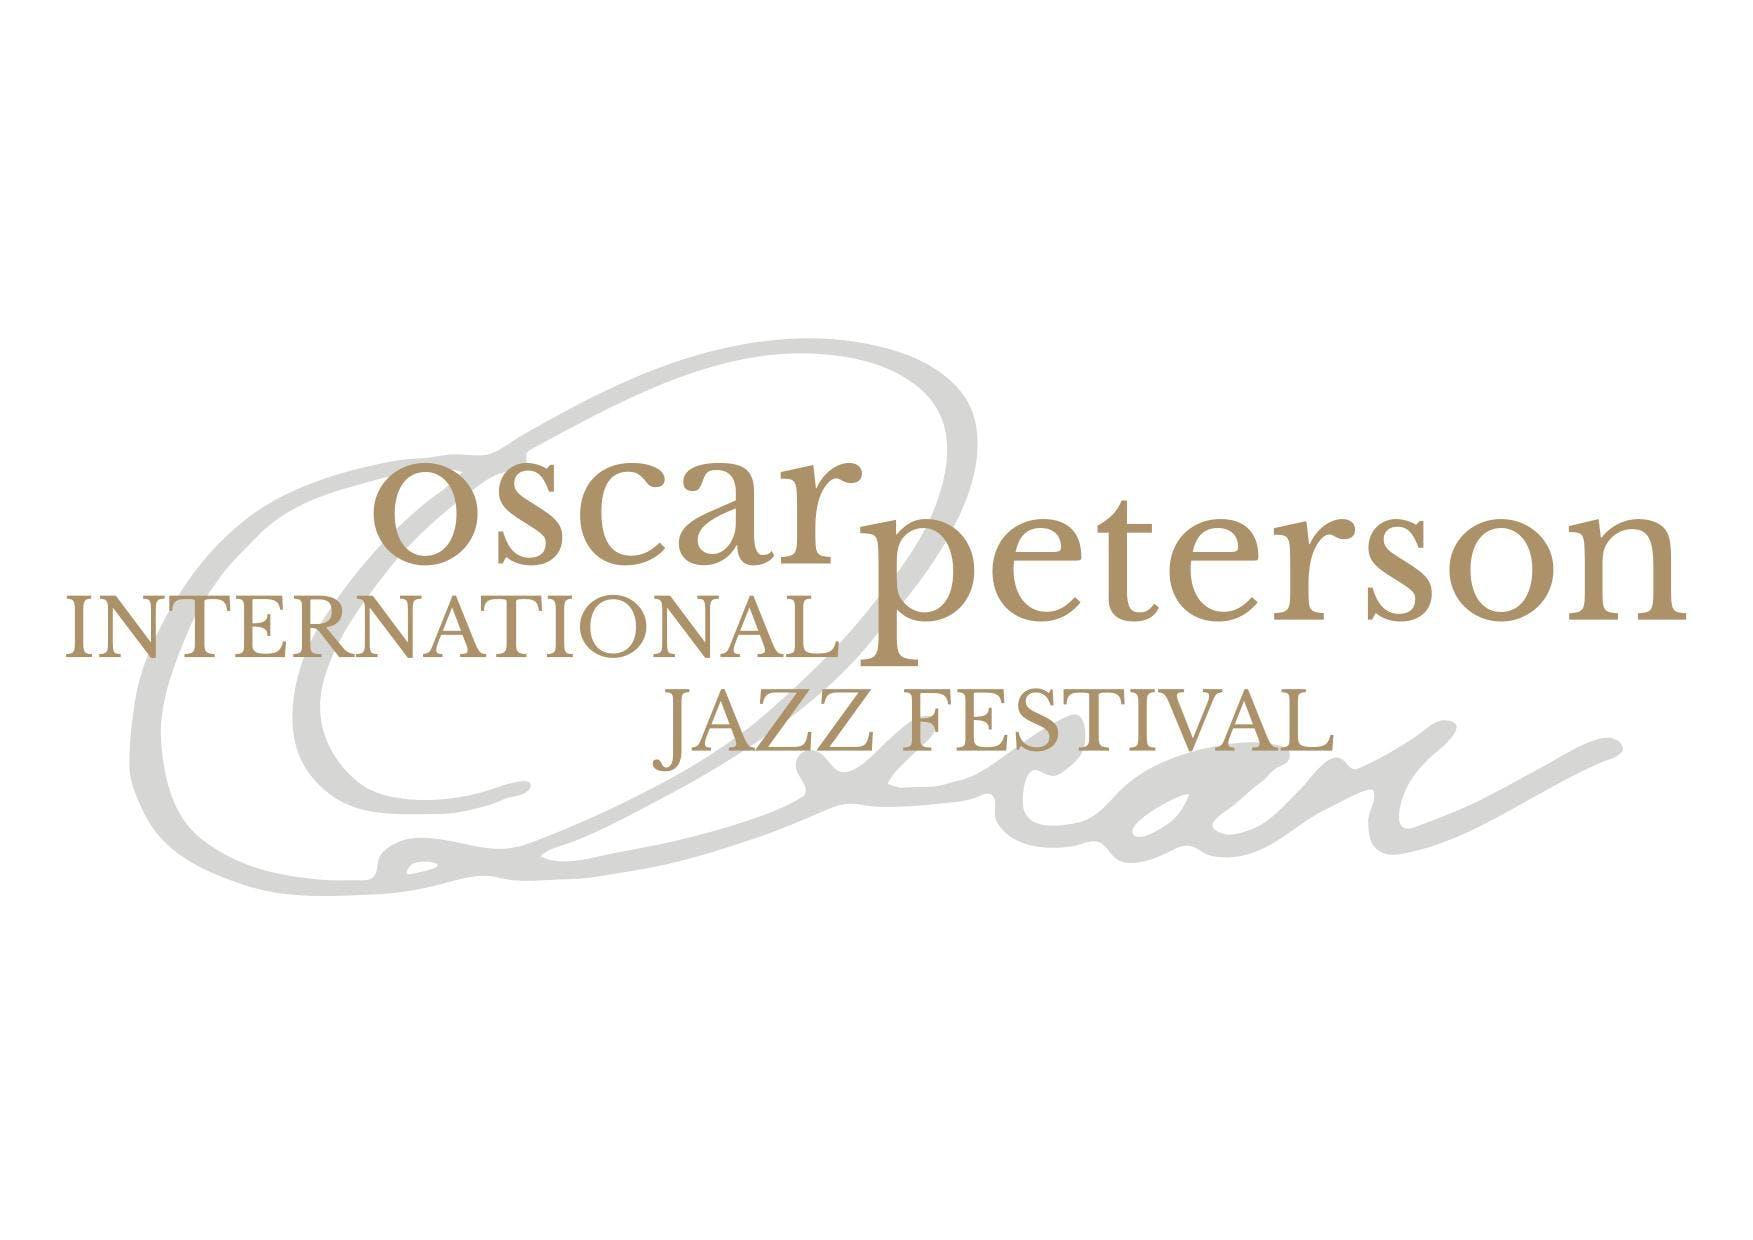 Oscar Peterson International Jazz Festival: M